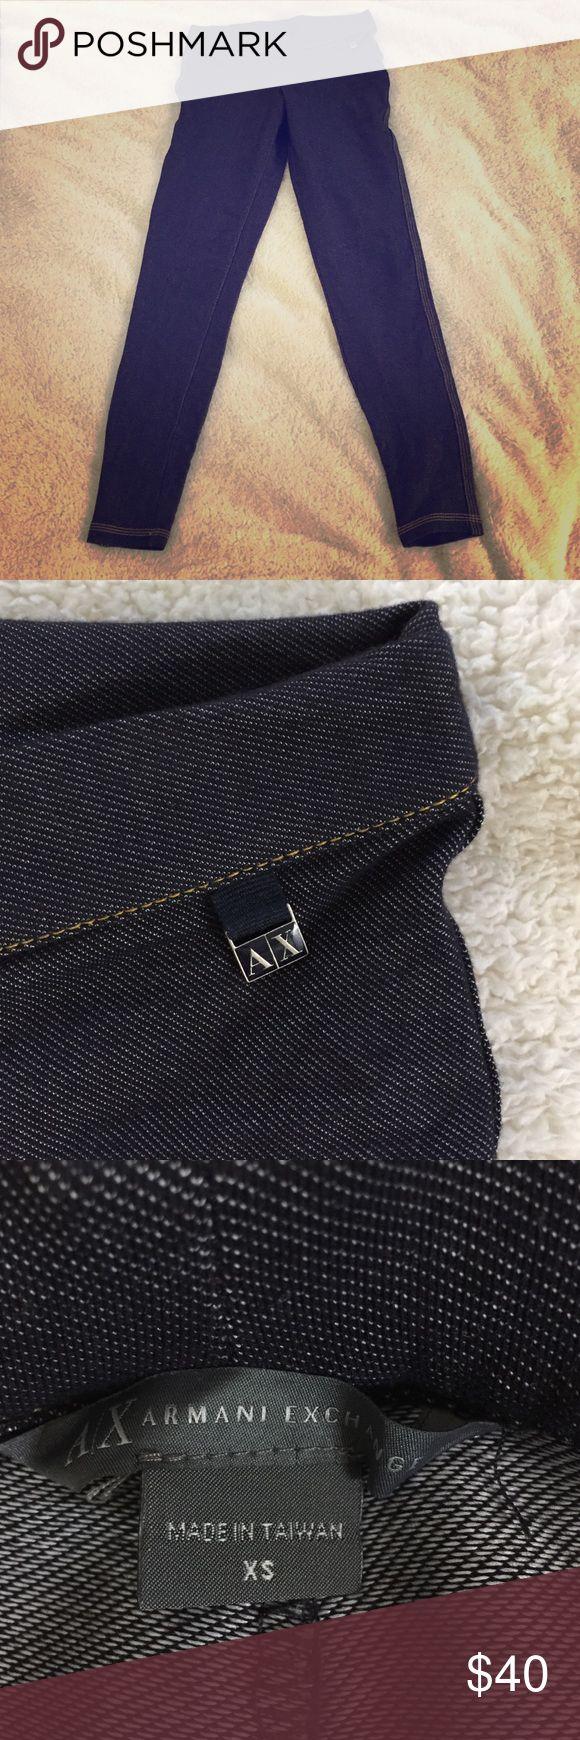 Armani Exchange Leggings Denim inspired leggings by Armani Exchange Armani Exchange Pants Leggings